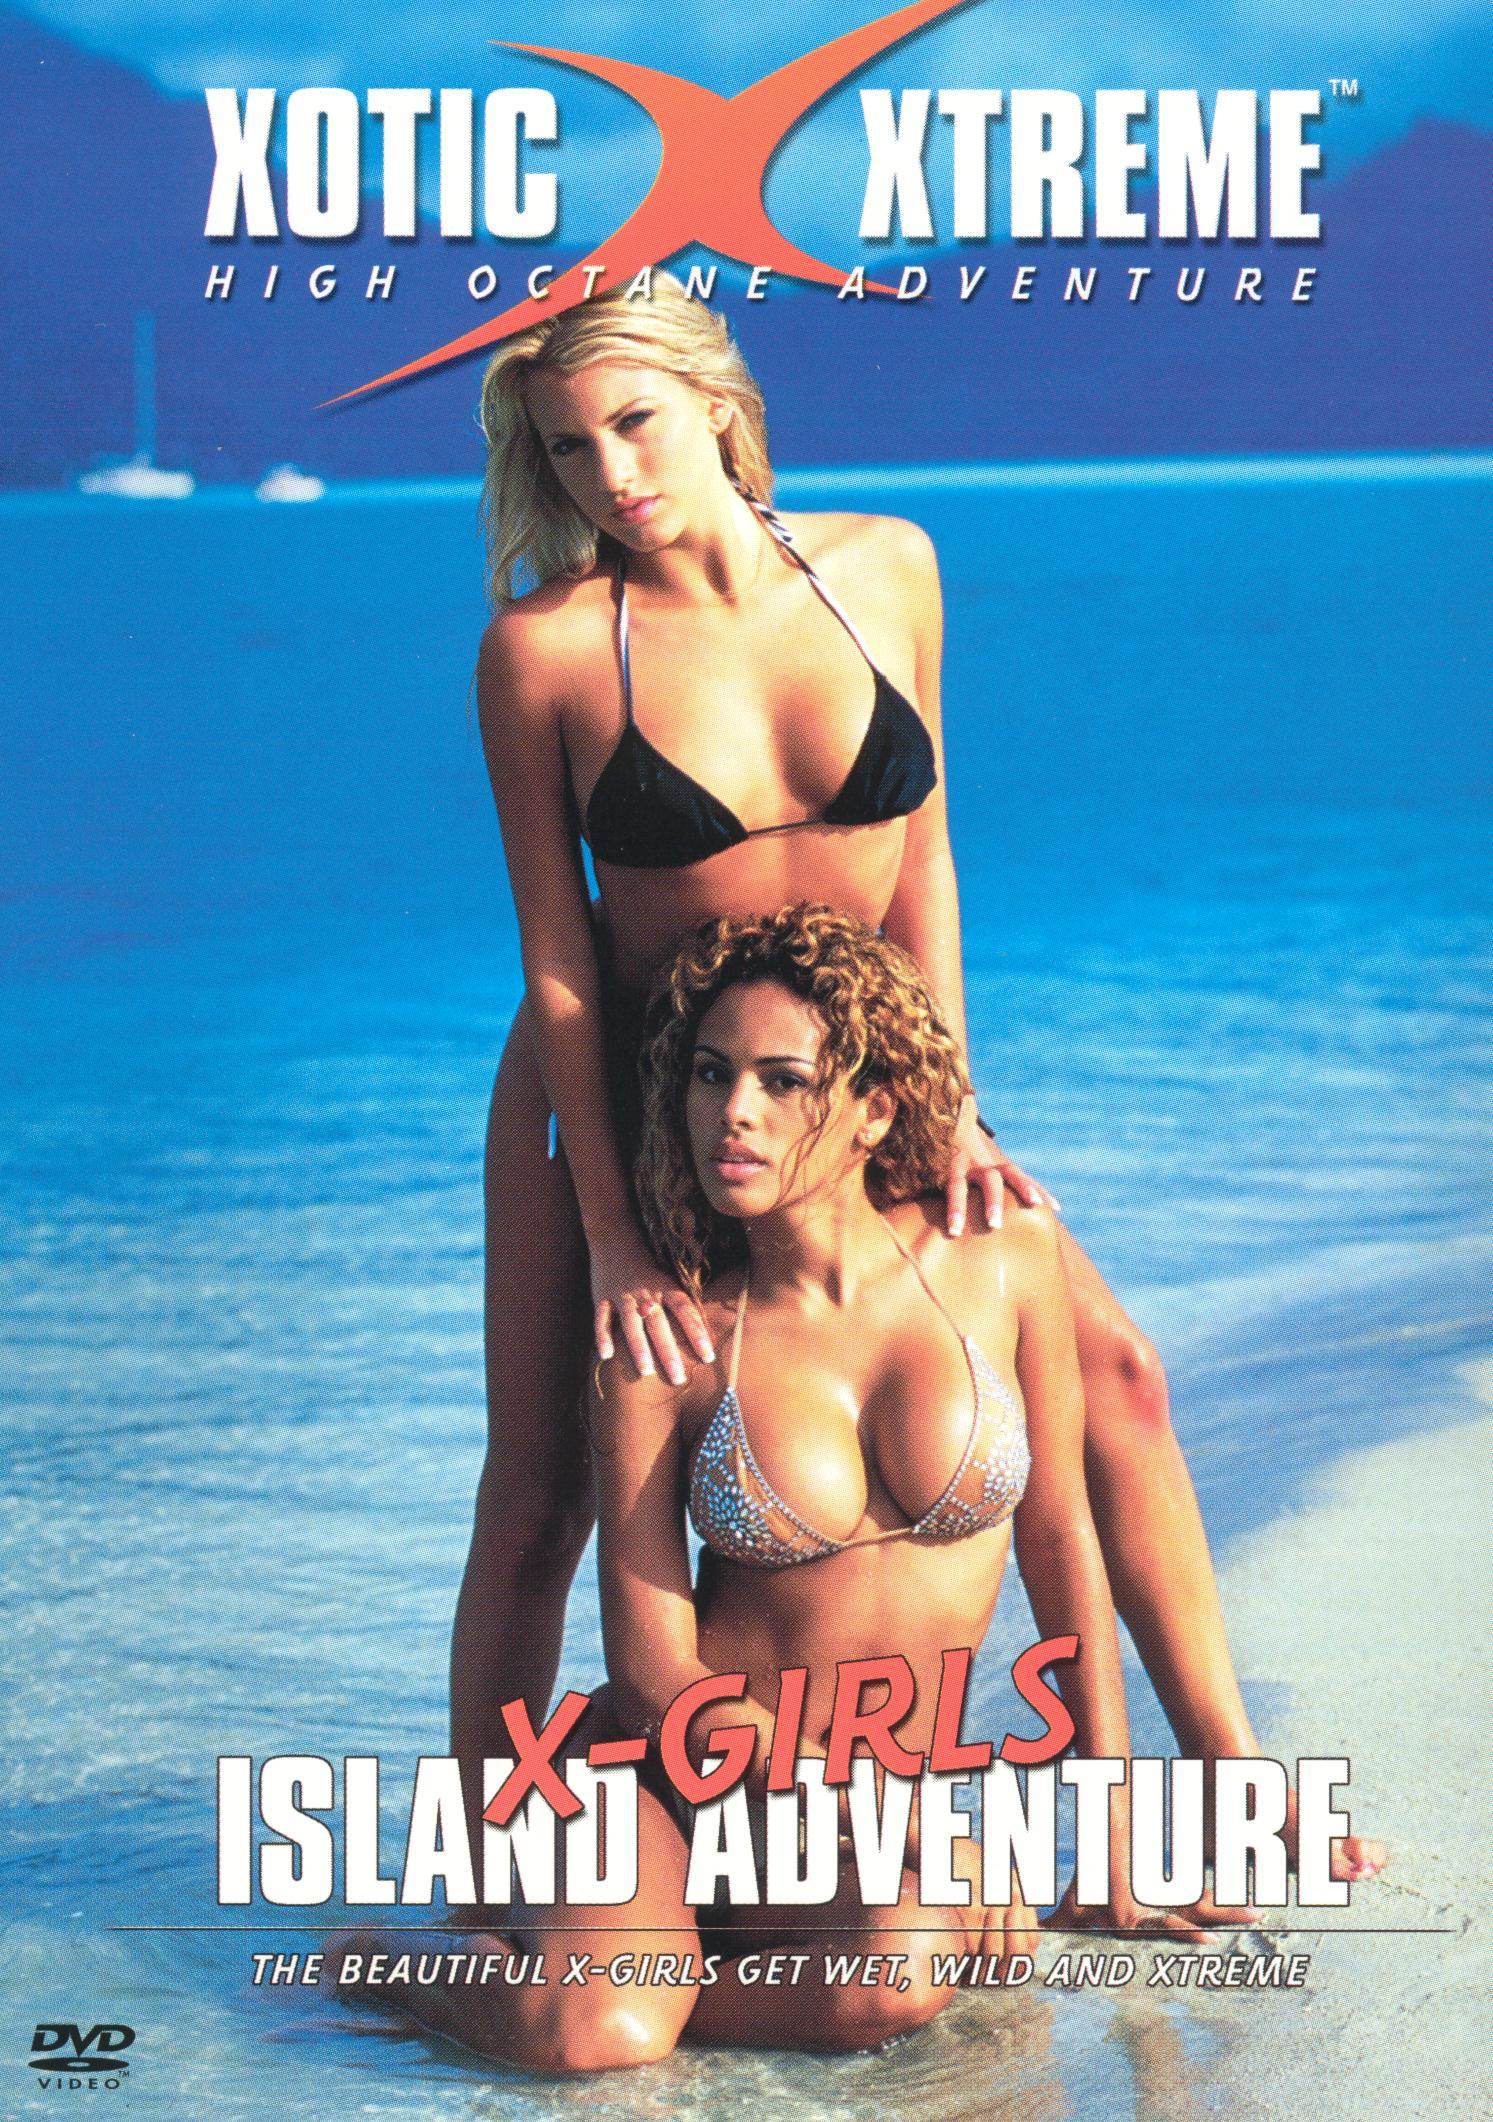 Xotic Xtreme: X-Girls Island Adventure